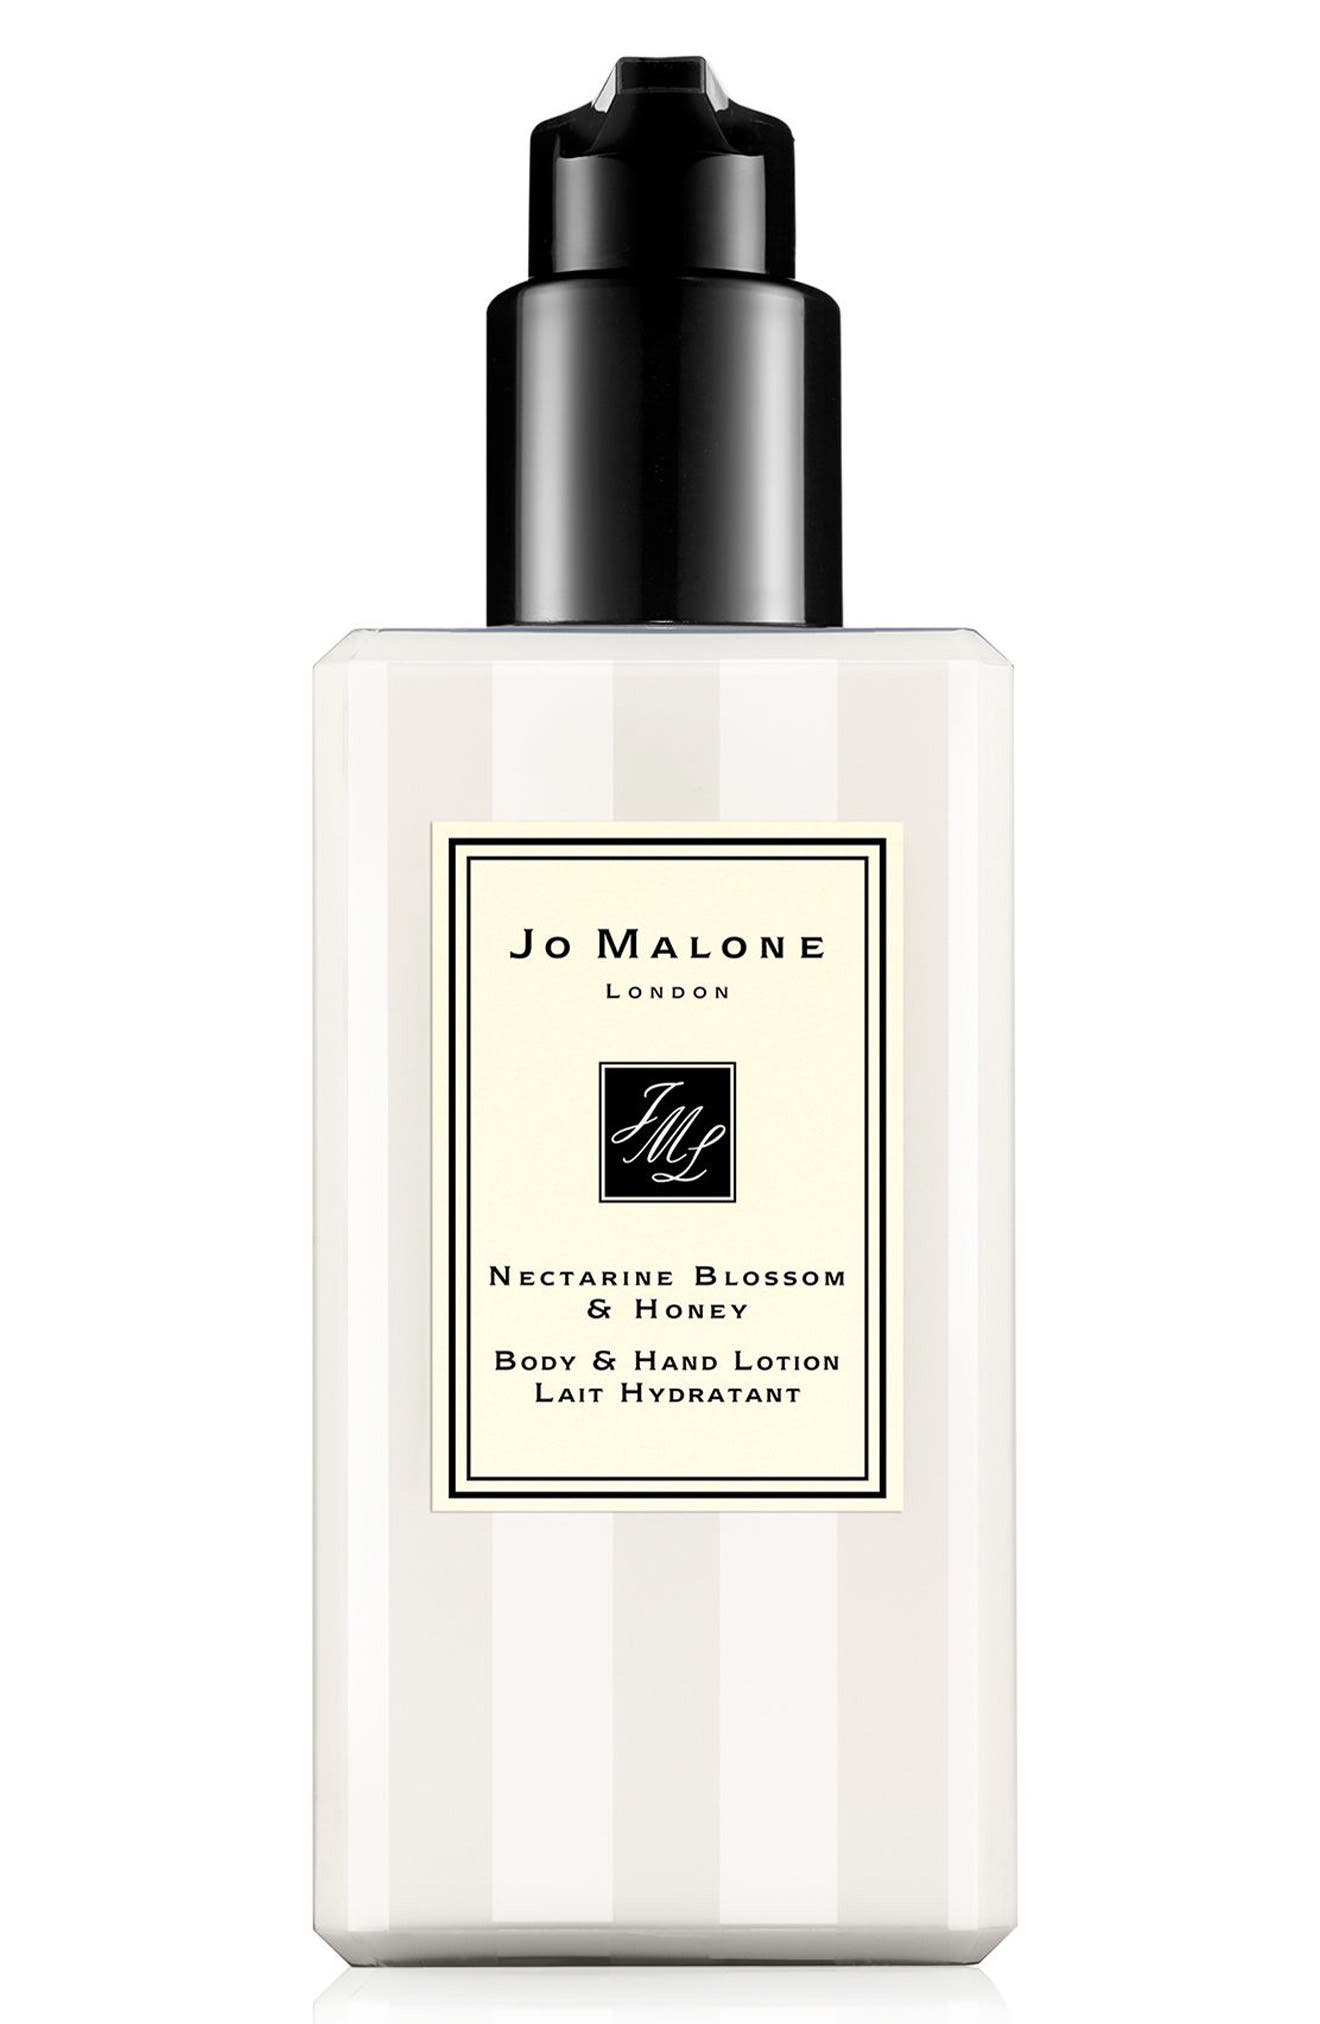 Jo Malone London™ 'Nectarine Blossom & Honey' Body & Hand Lotion